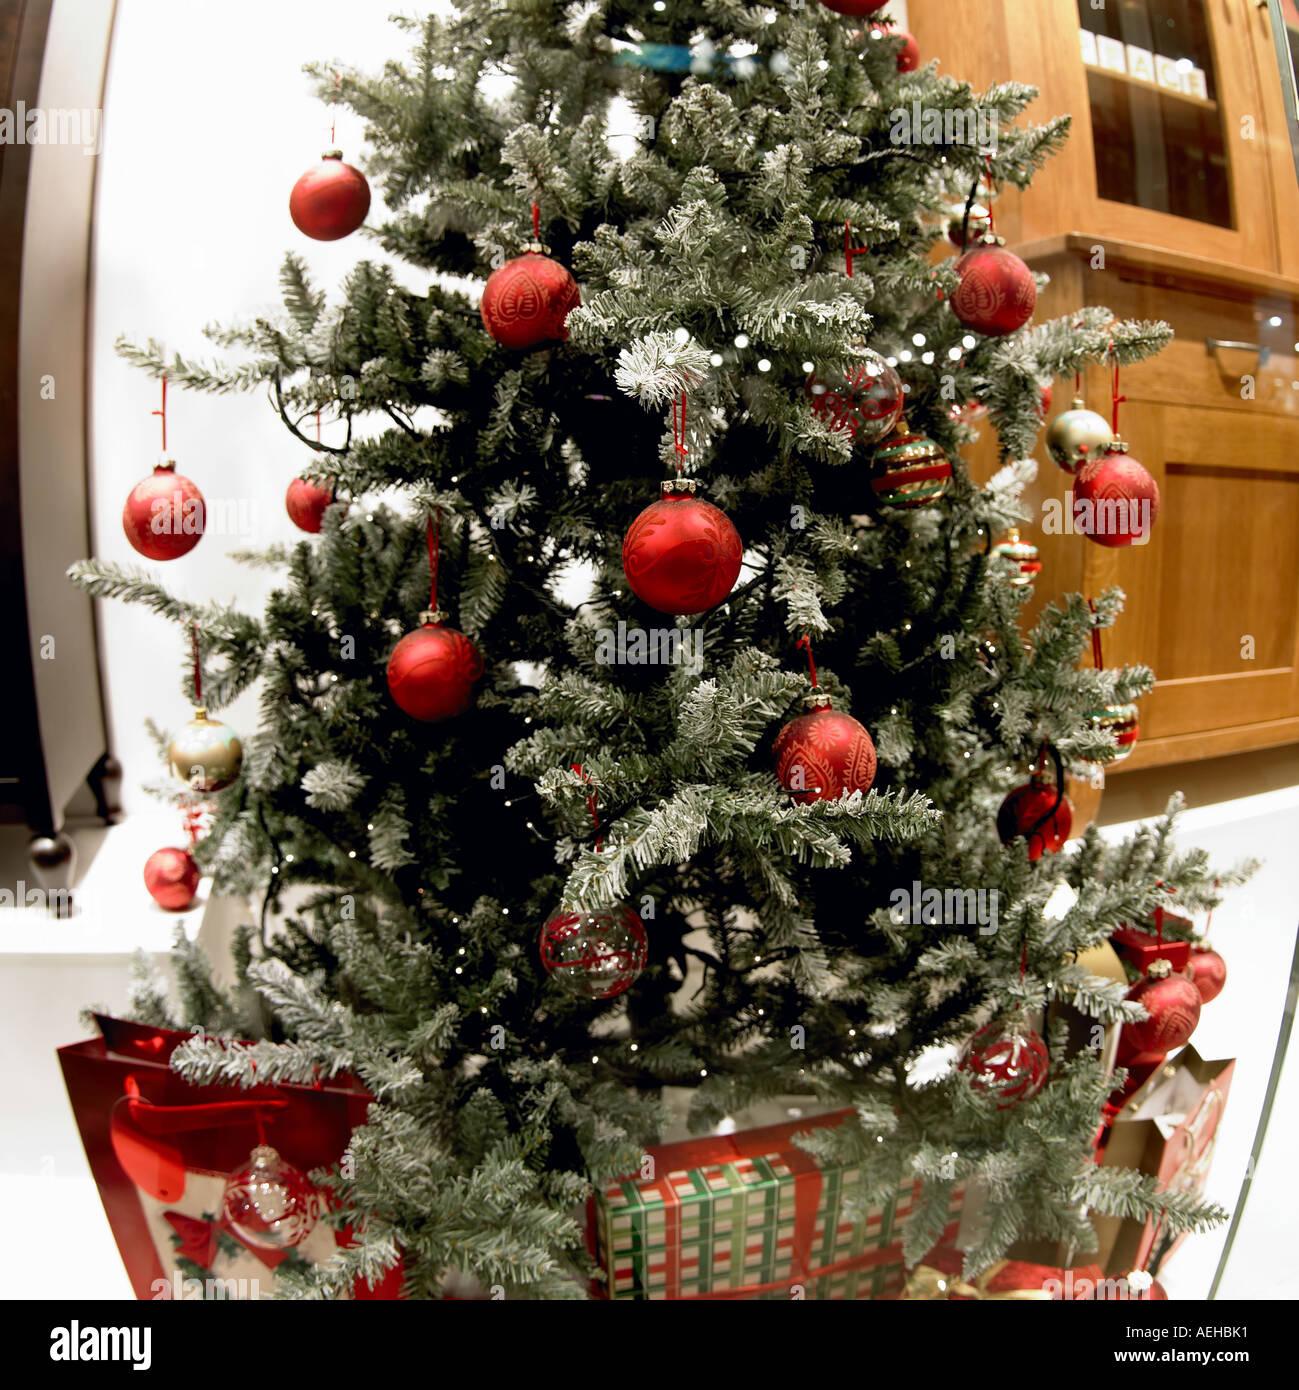 Christmas tree, shop window, Manchester England Stock Photo